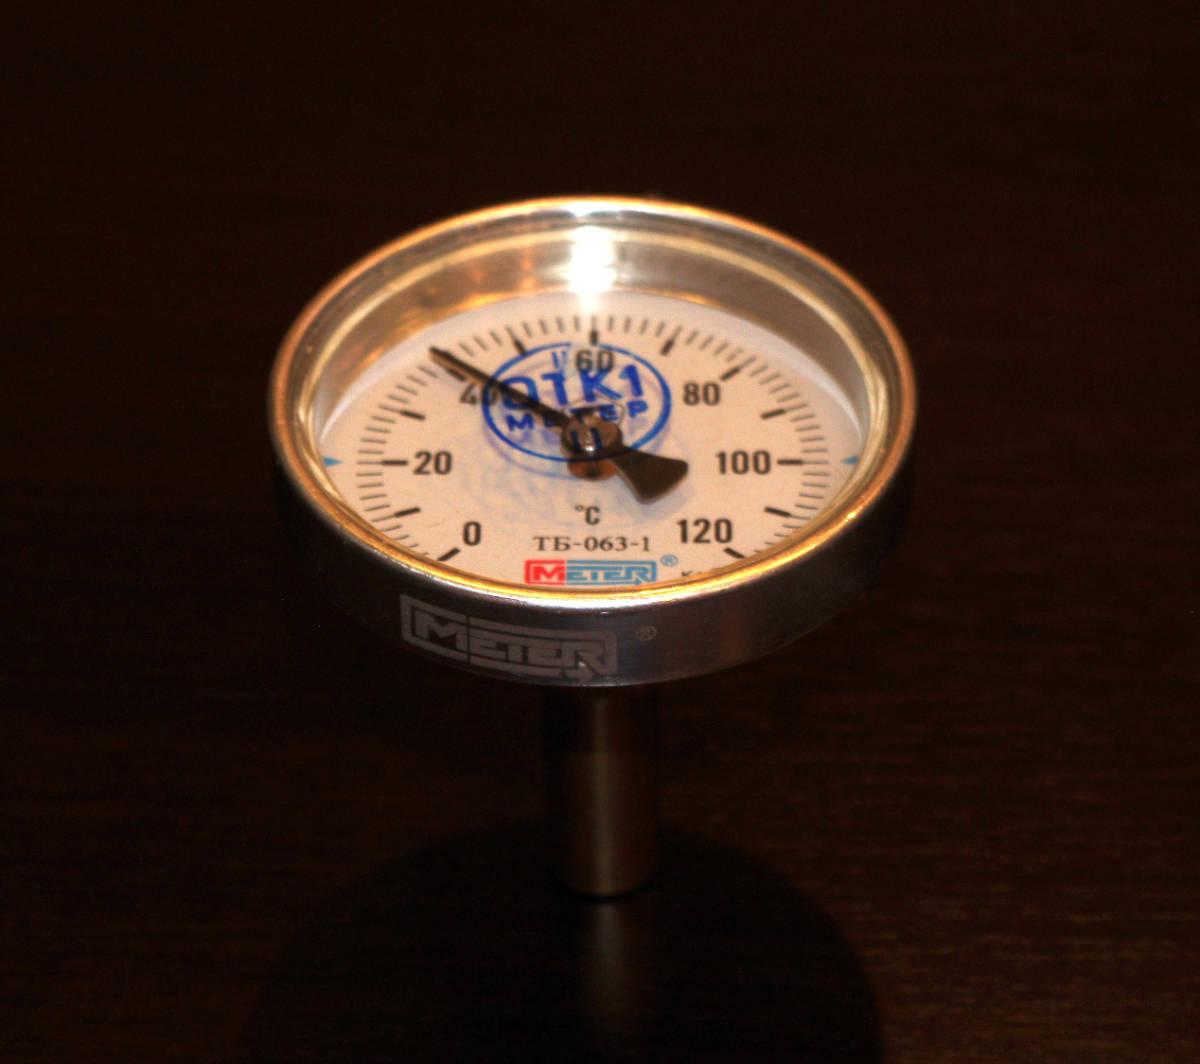 Форум термометр для самогонного аппарата самогонный аппарат своими руками змеевик видео